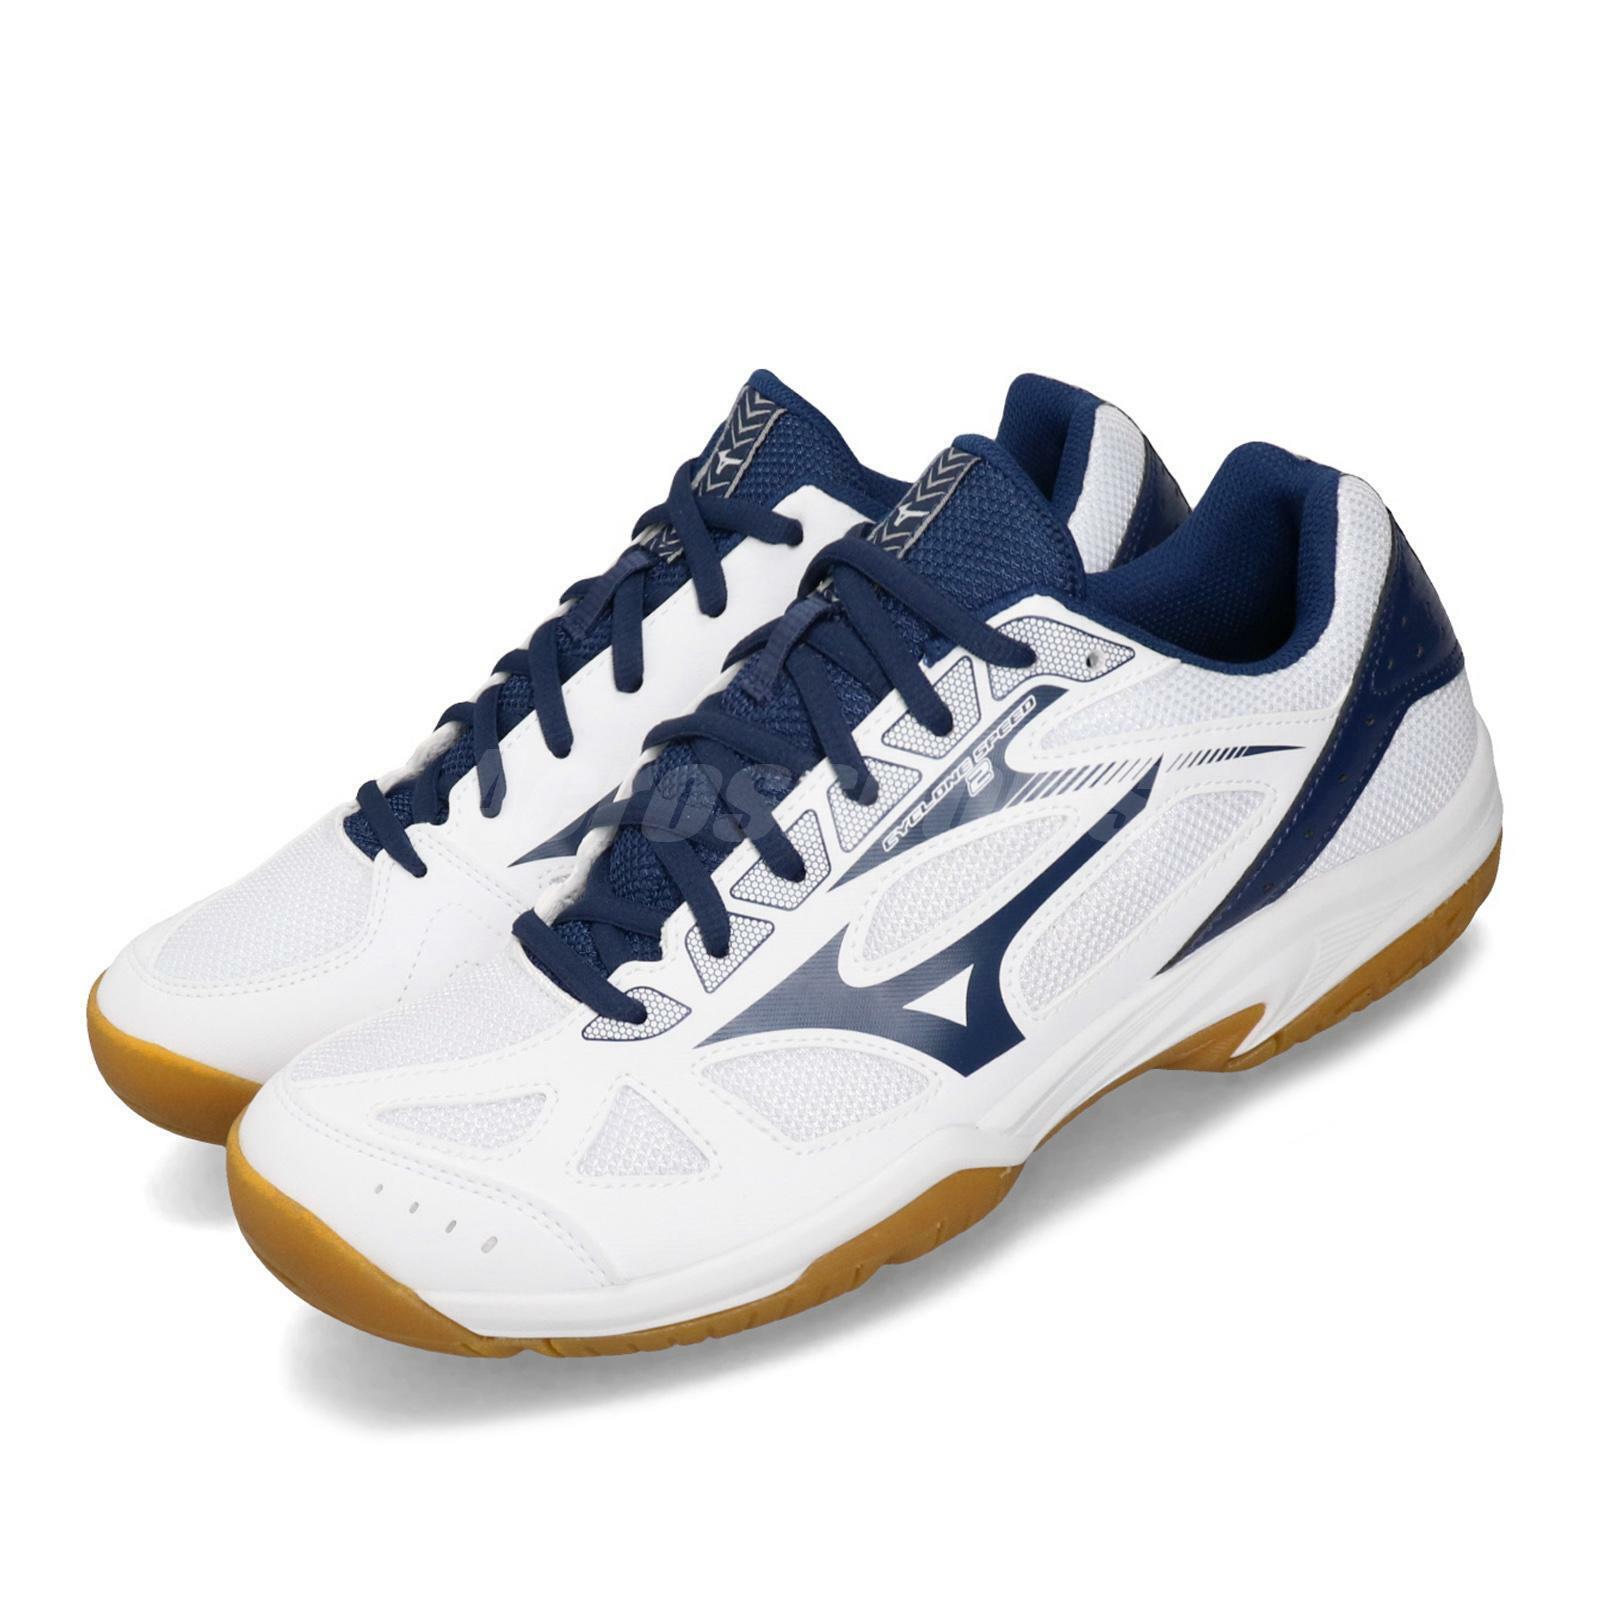 Mizuno Cyclone Speed 2 blanc bleu Volleyball Badminton chaussures paniers V1GA1980-16